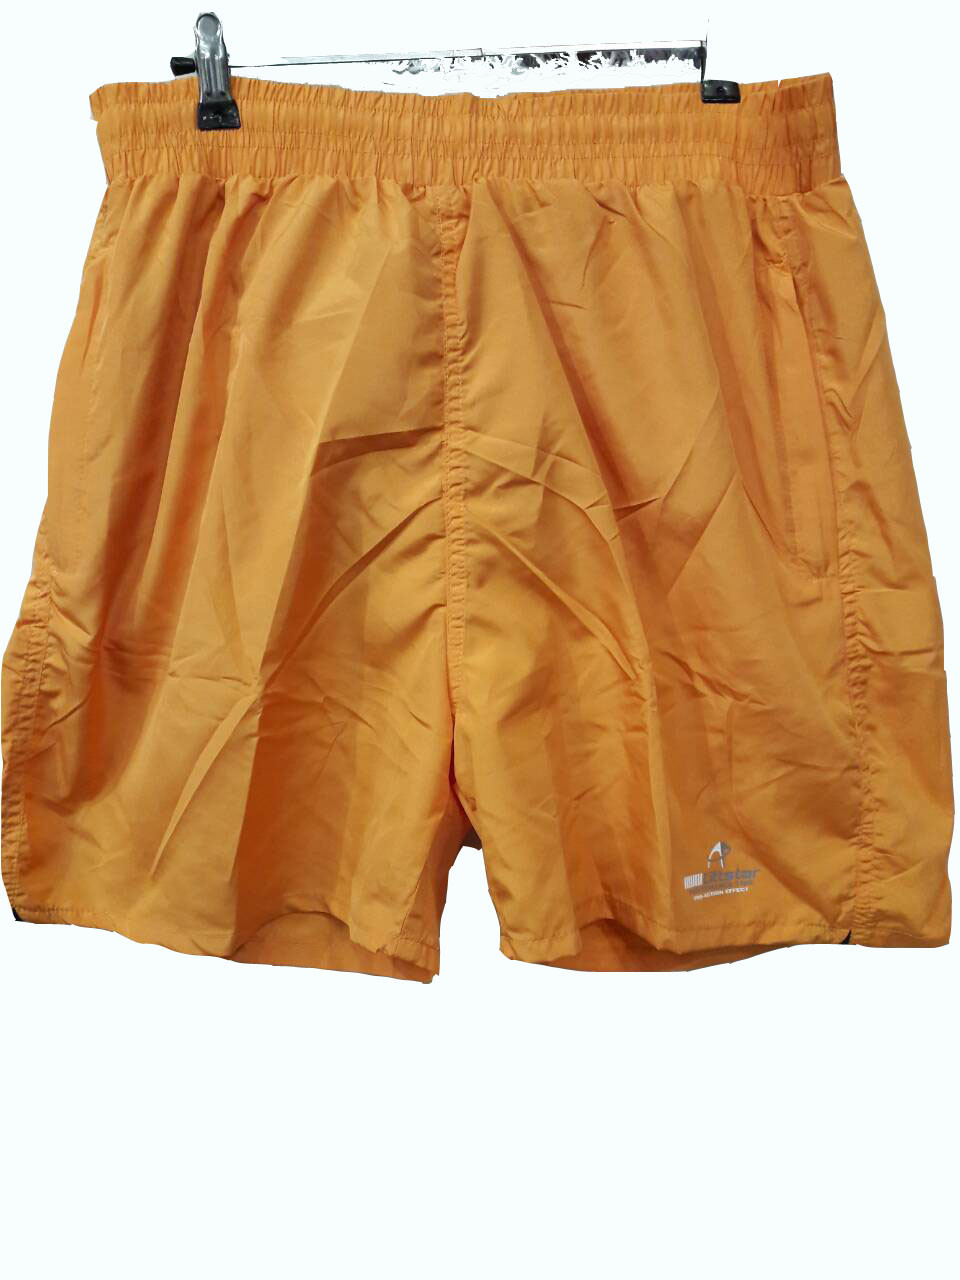 Шорты мужские плащевые Littstar оранжевые